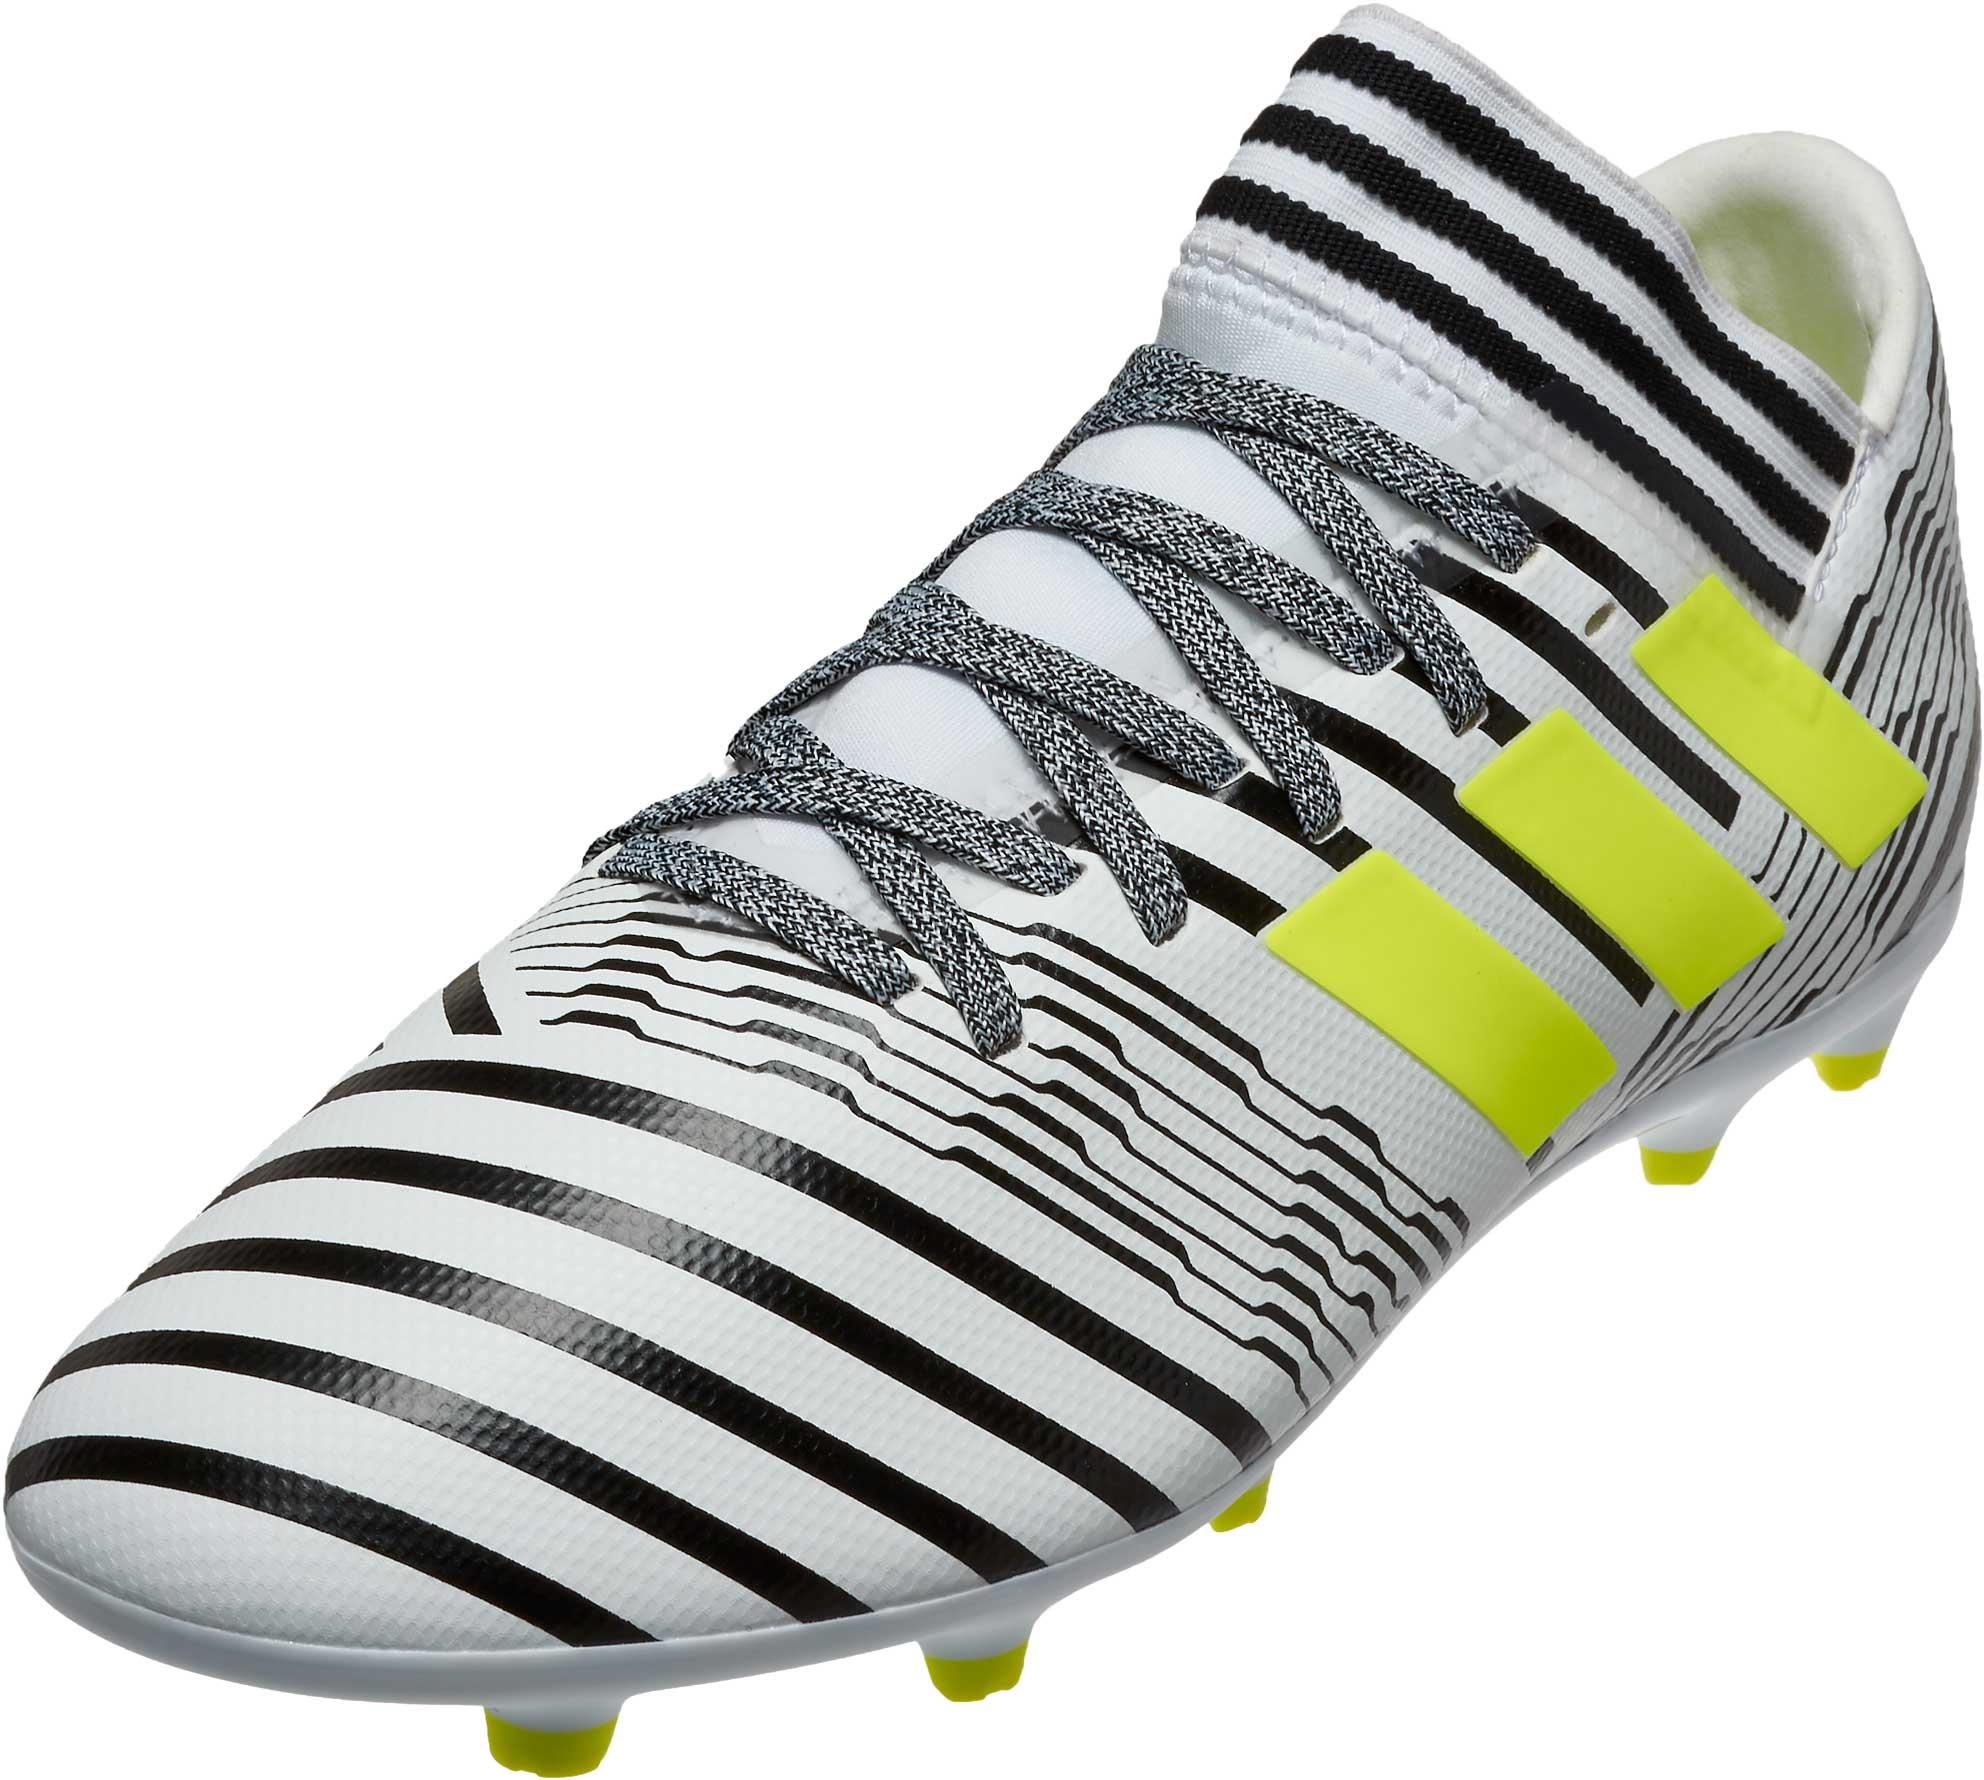 7493d07772e adidas Kids Nemeziz 17.3 FG Soccer Cleats - White & Solar Yellow ...